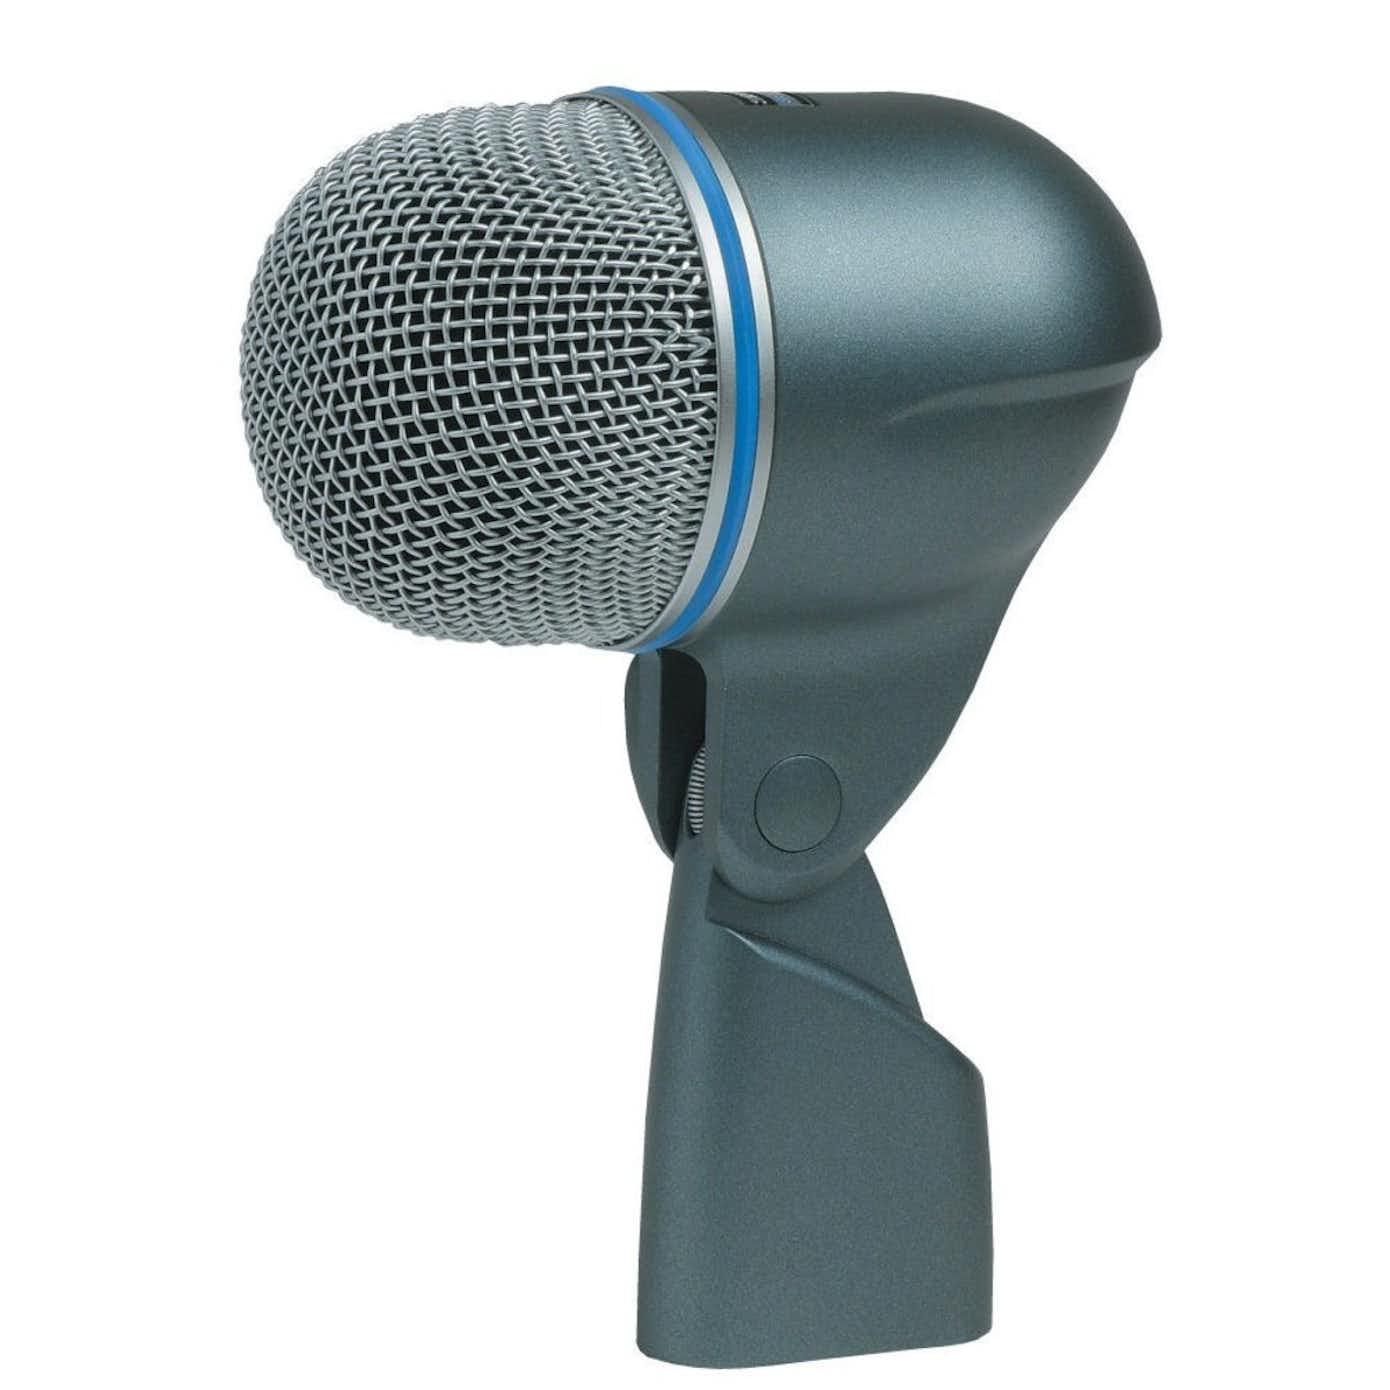 Shure BETA52A Stortromme mikrofon